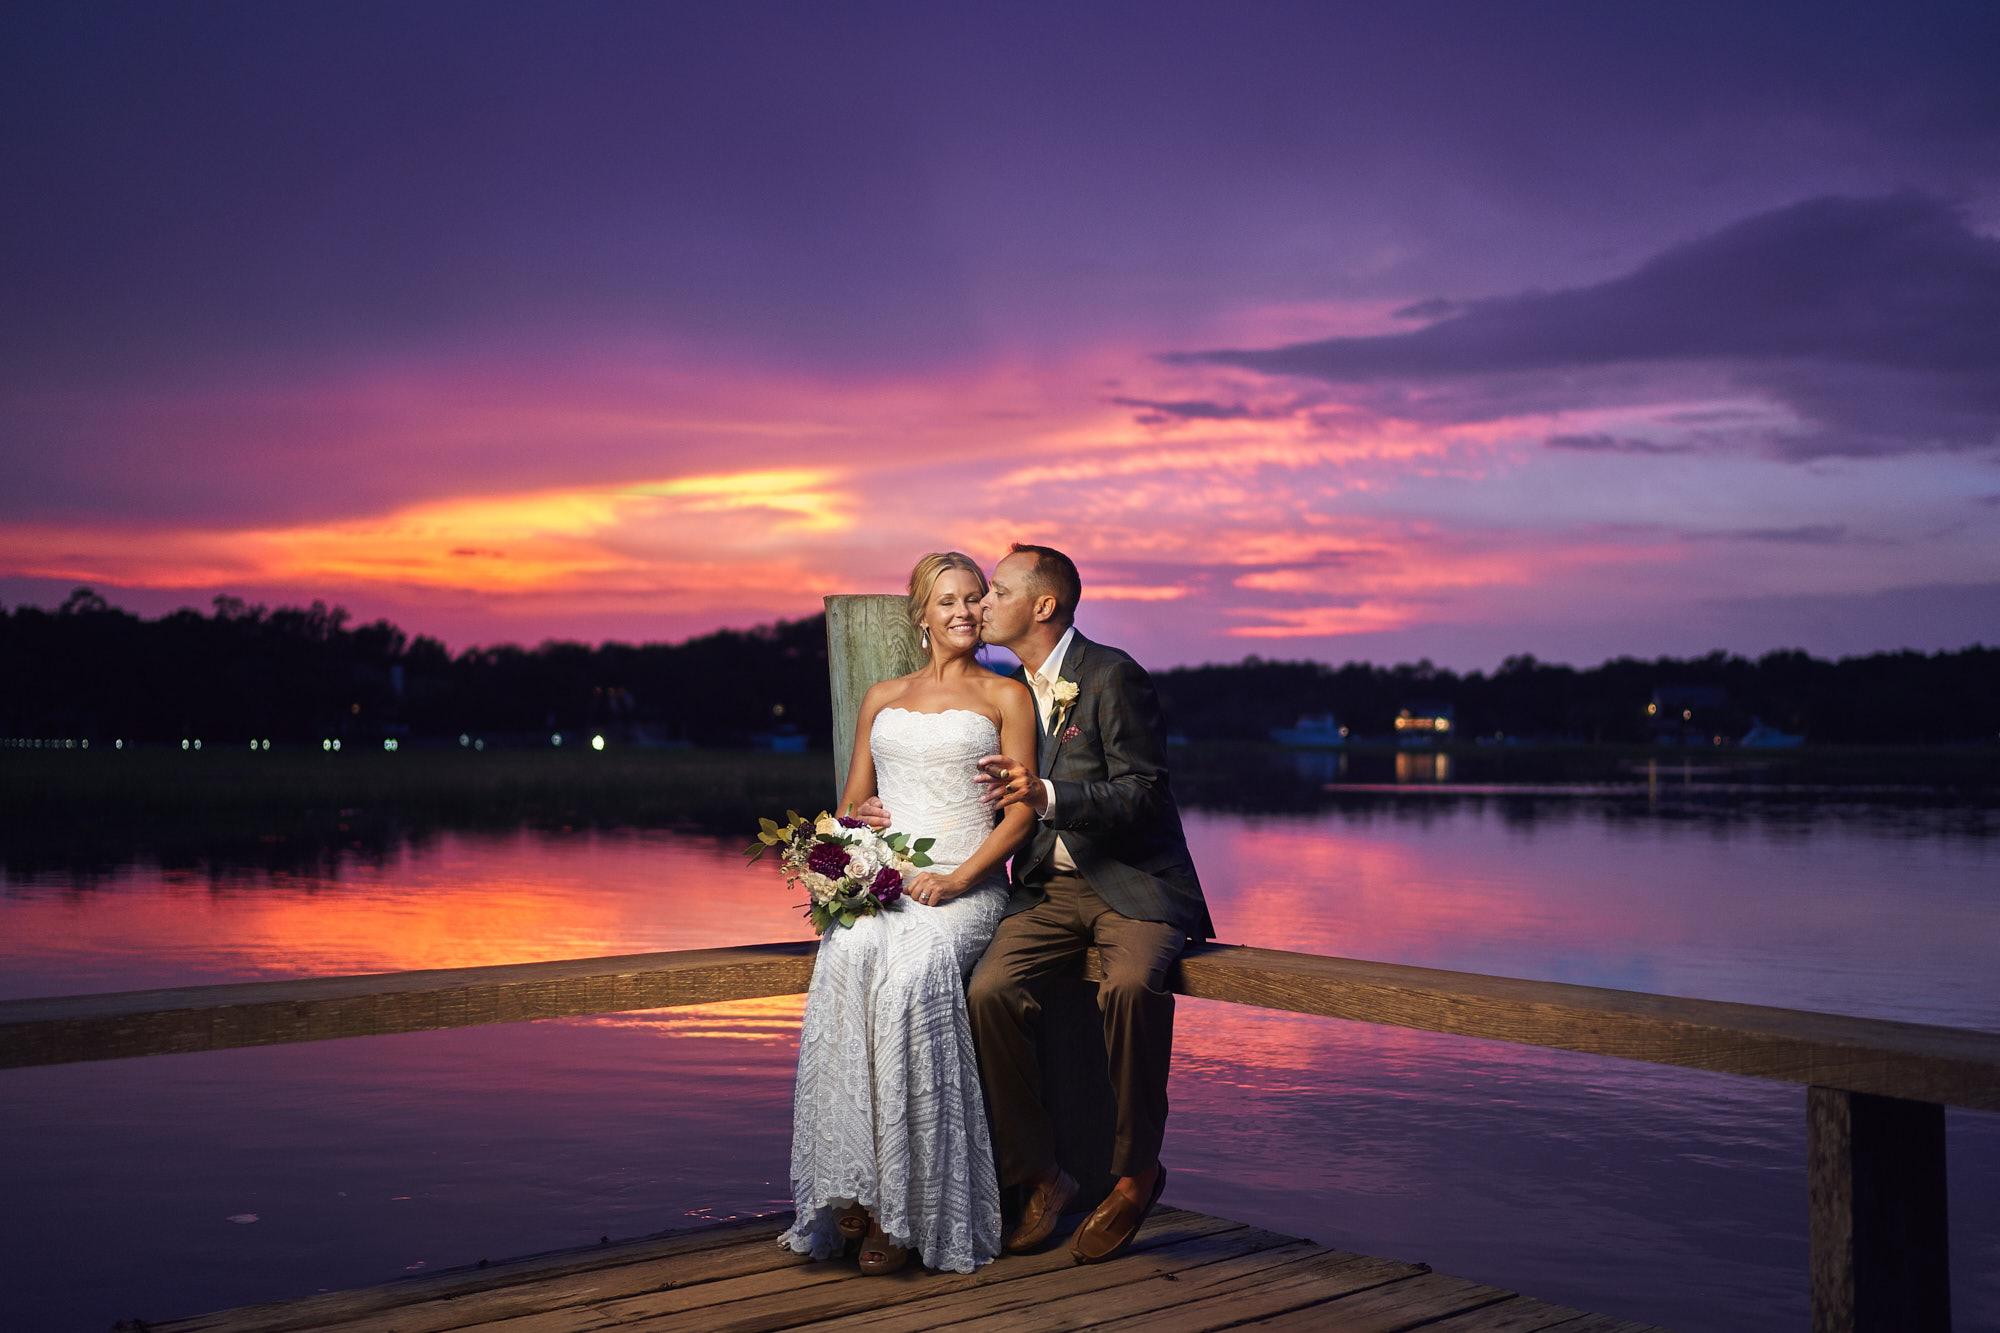 Nicholas Gore Weddings - Boone Hall Wedding - Charleston SC